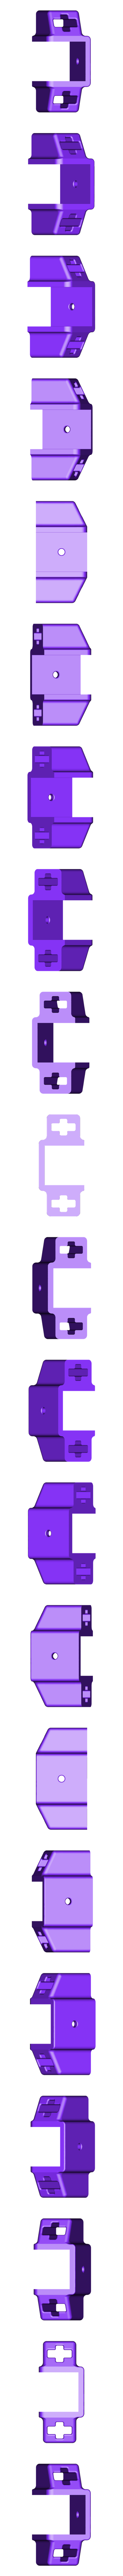 Clamp_Holder.stl Download free STL file Triton Clamp Mount • 3D printable design, MuSSy